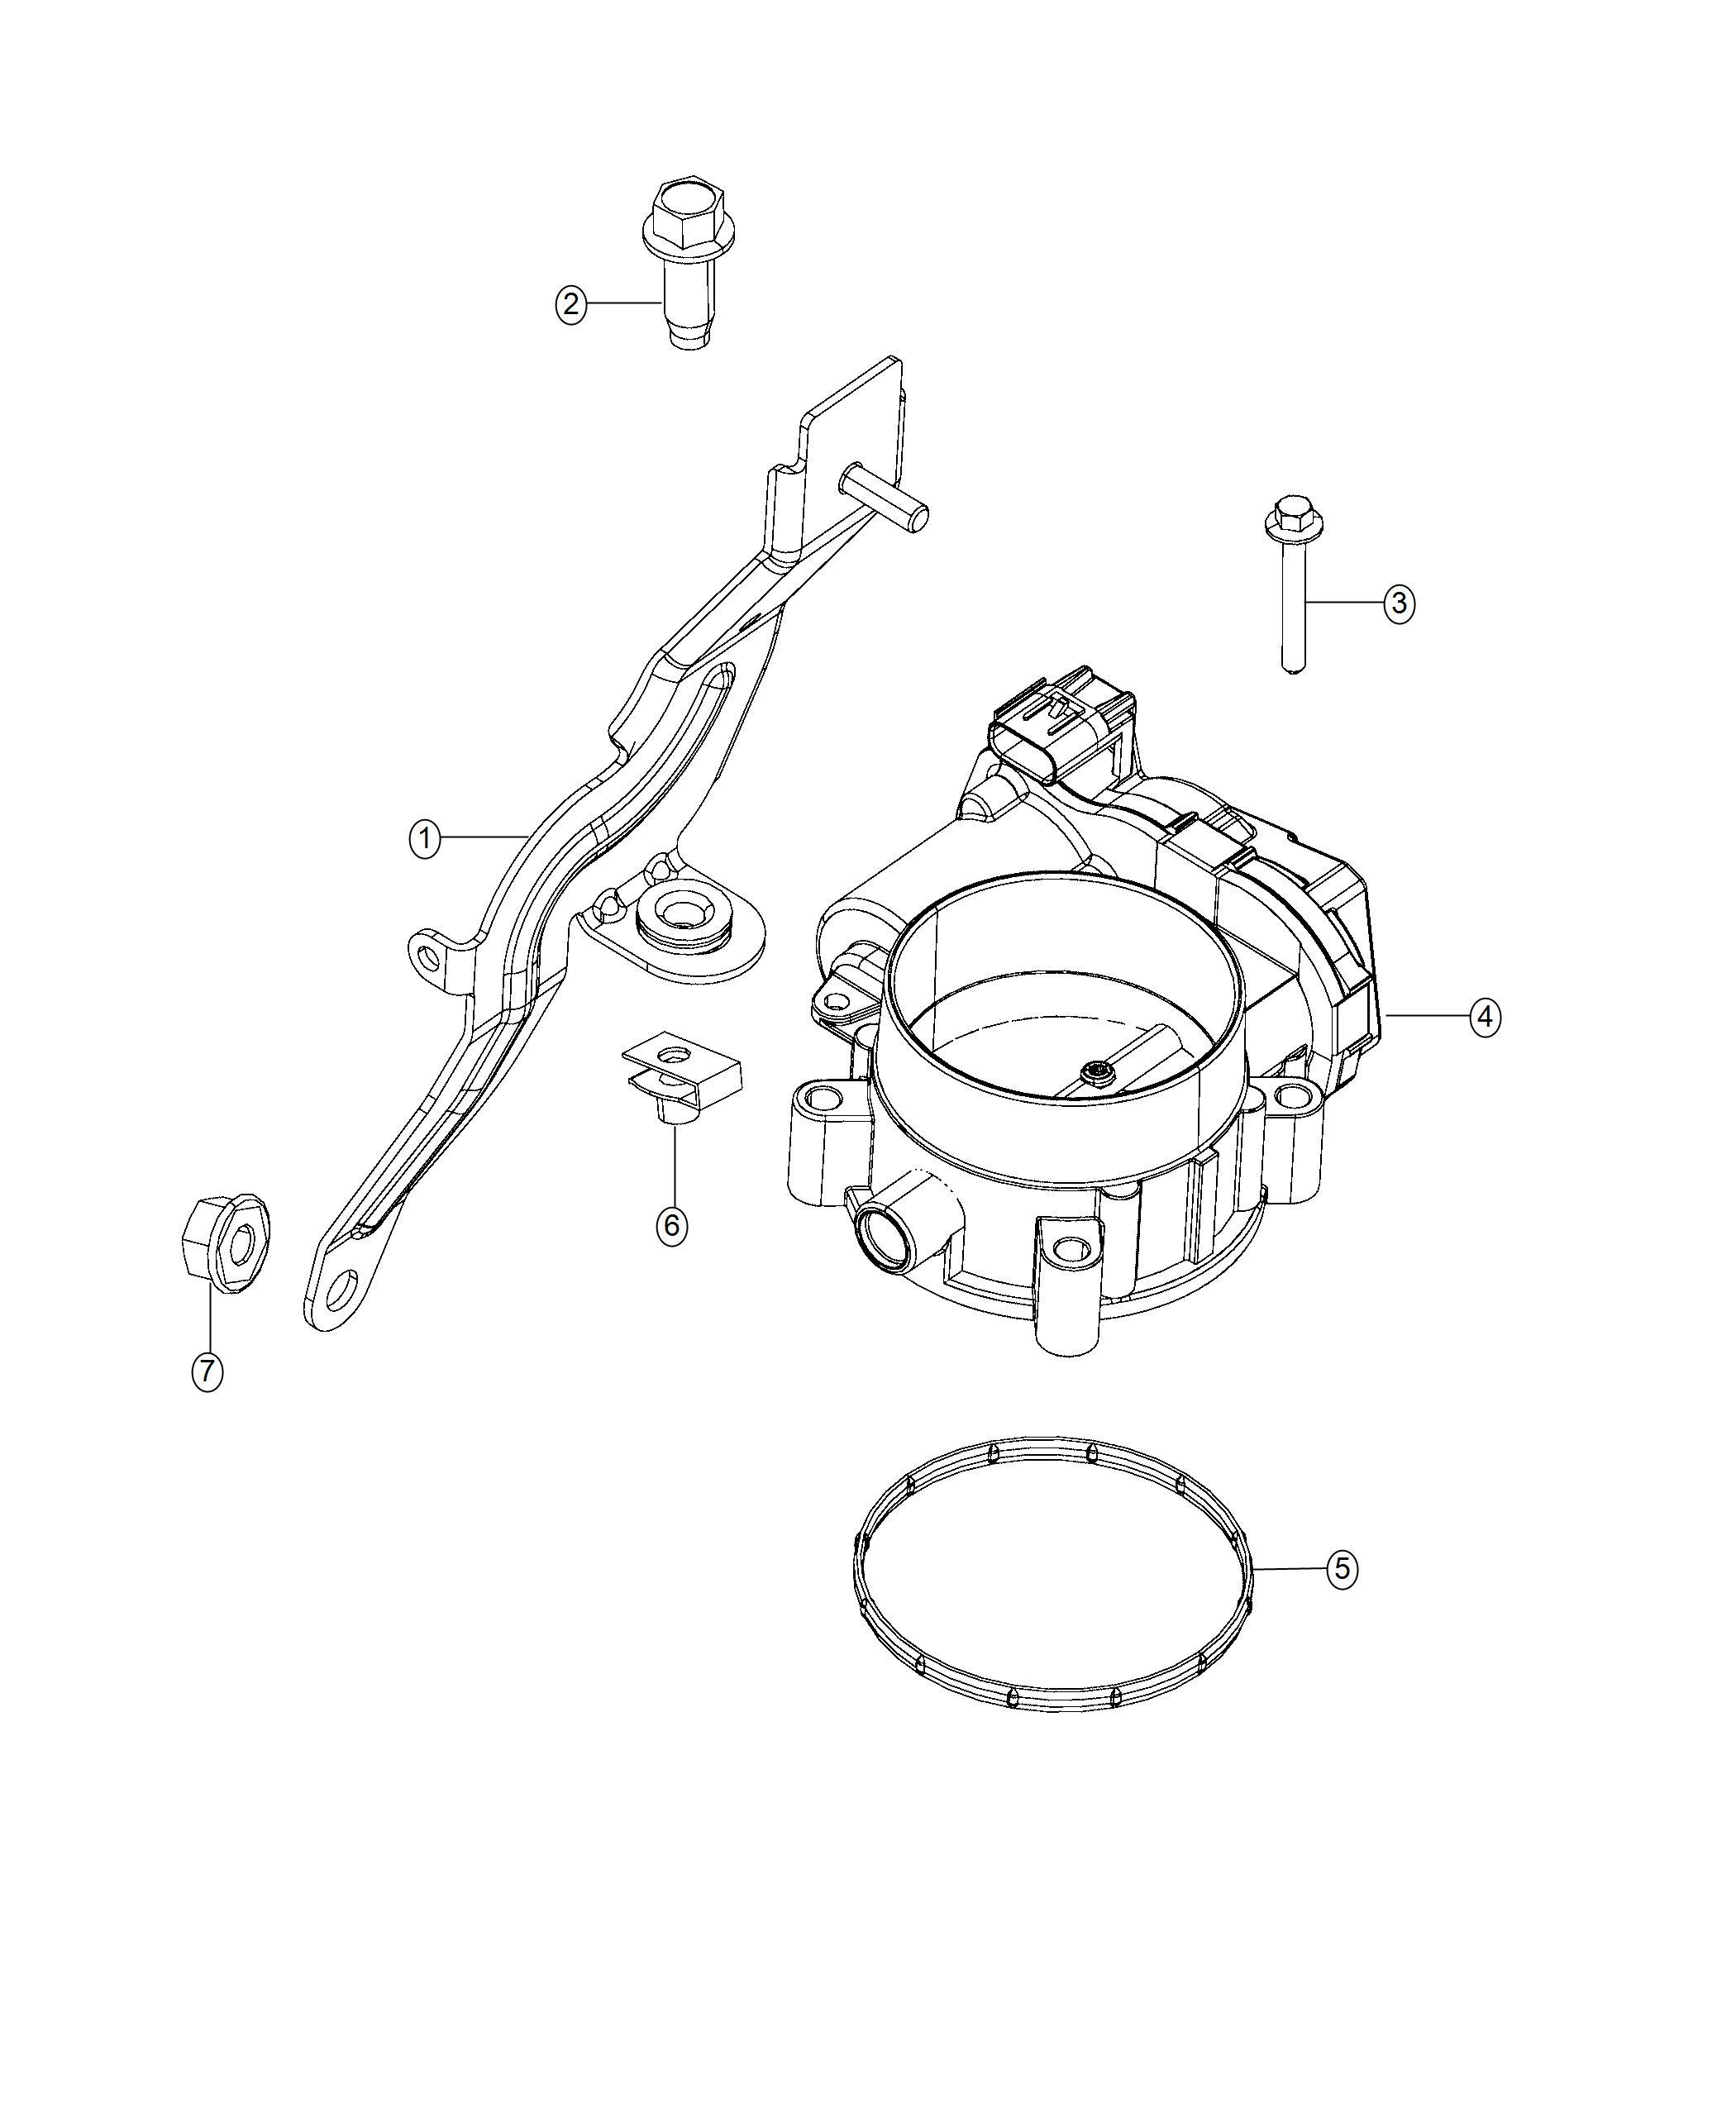 Ram Seal Throttle Body To Intake Engine Cng Ezf